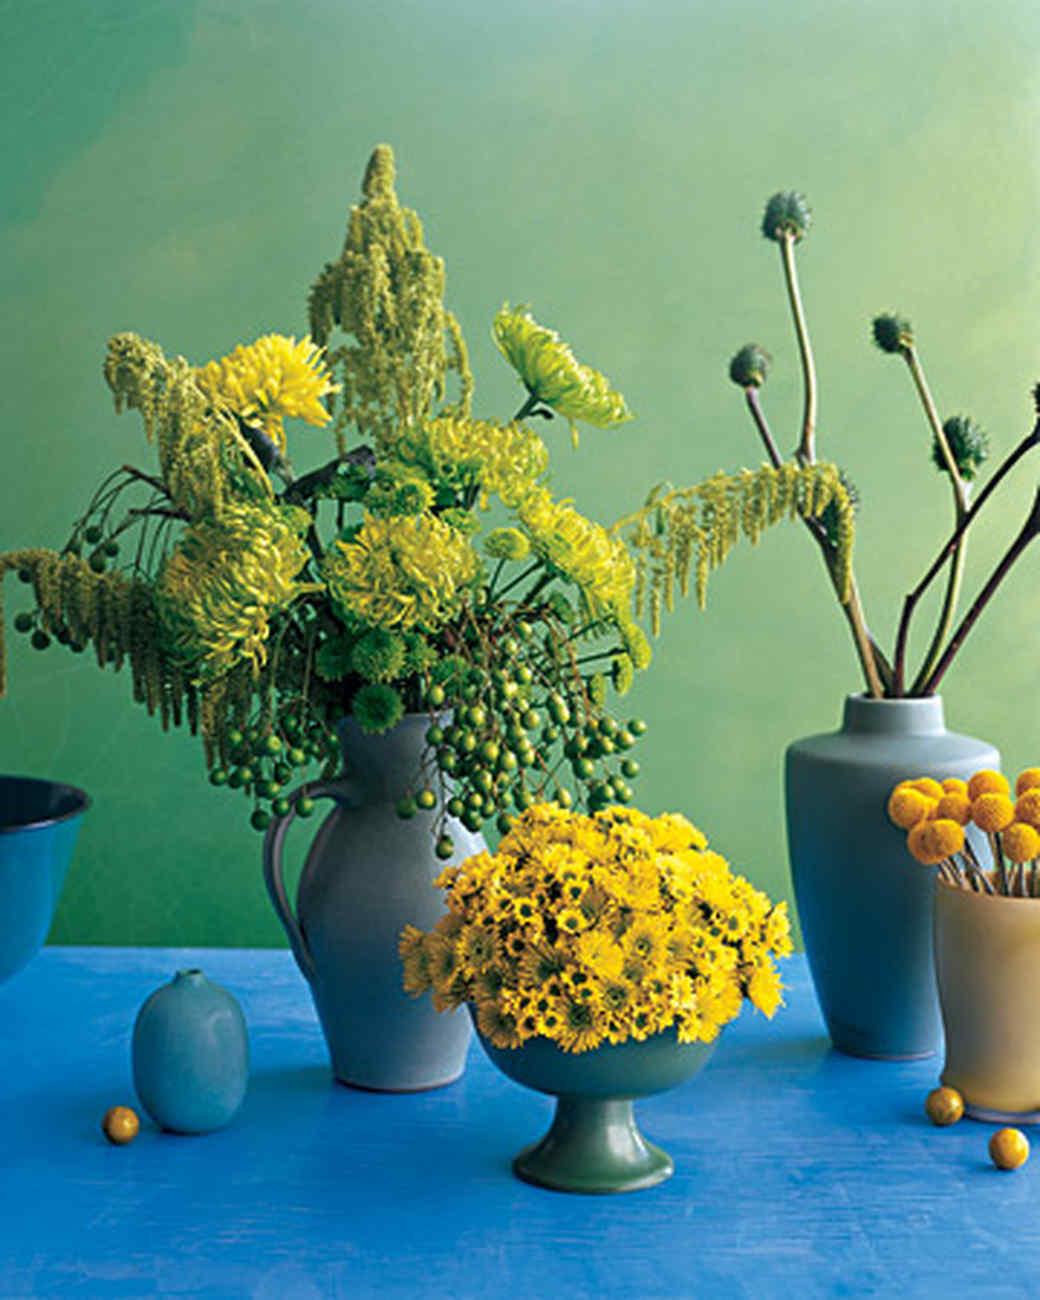 Chrysanthemum Dome Centerpiece